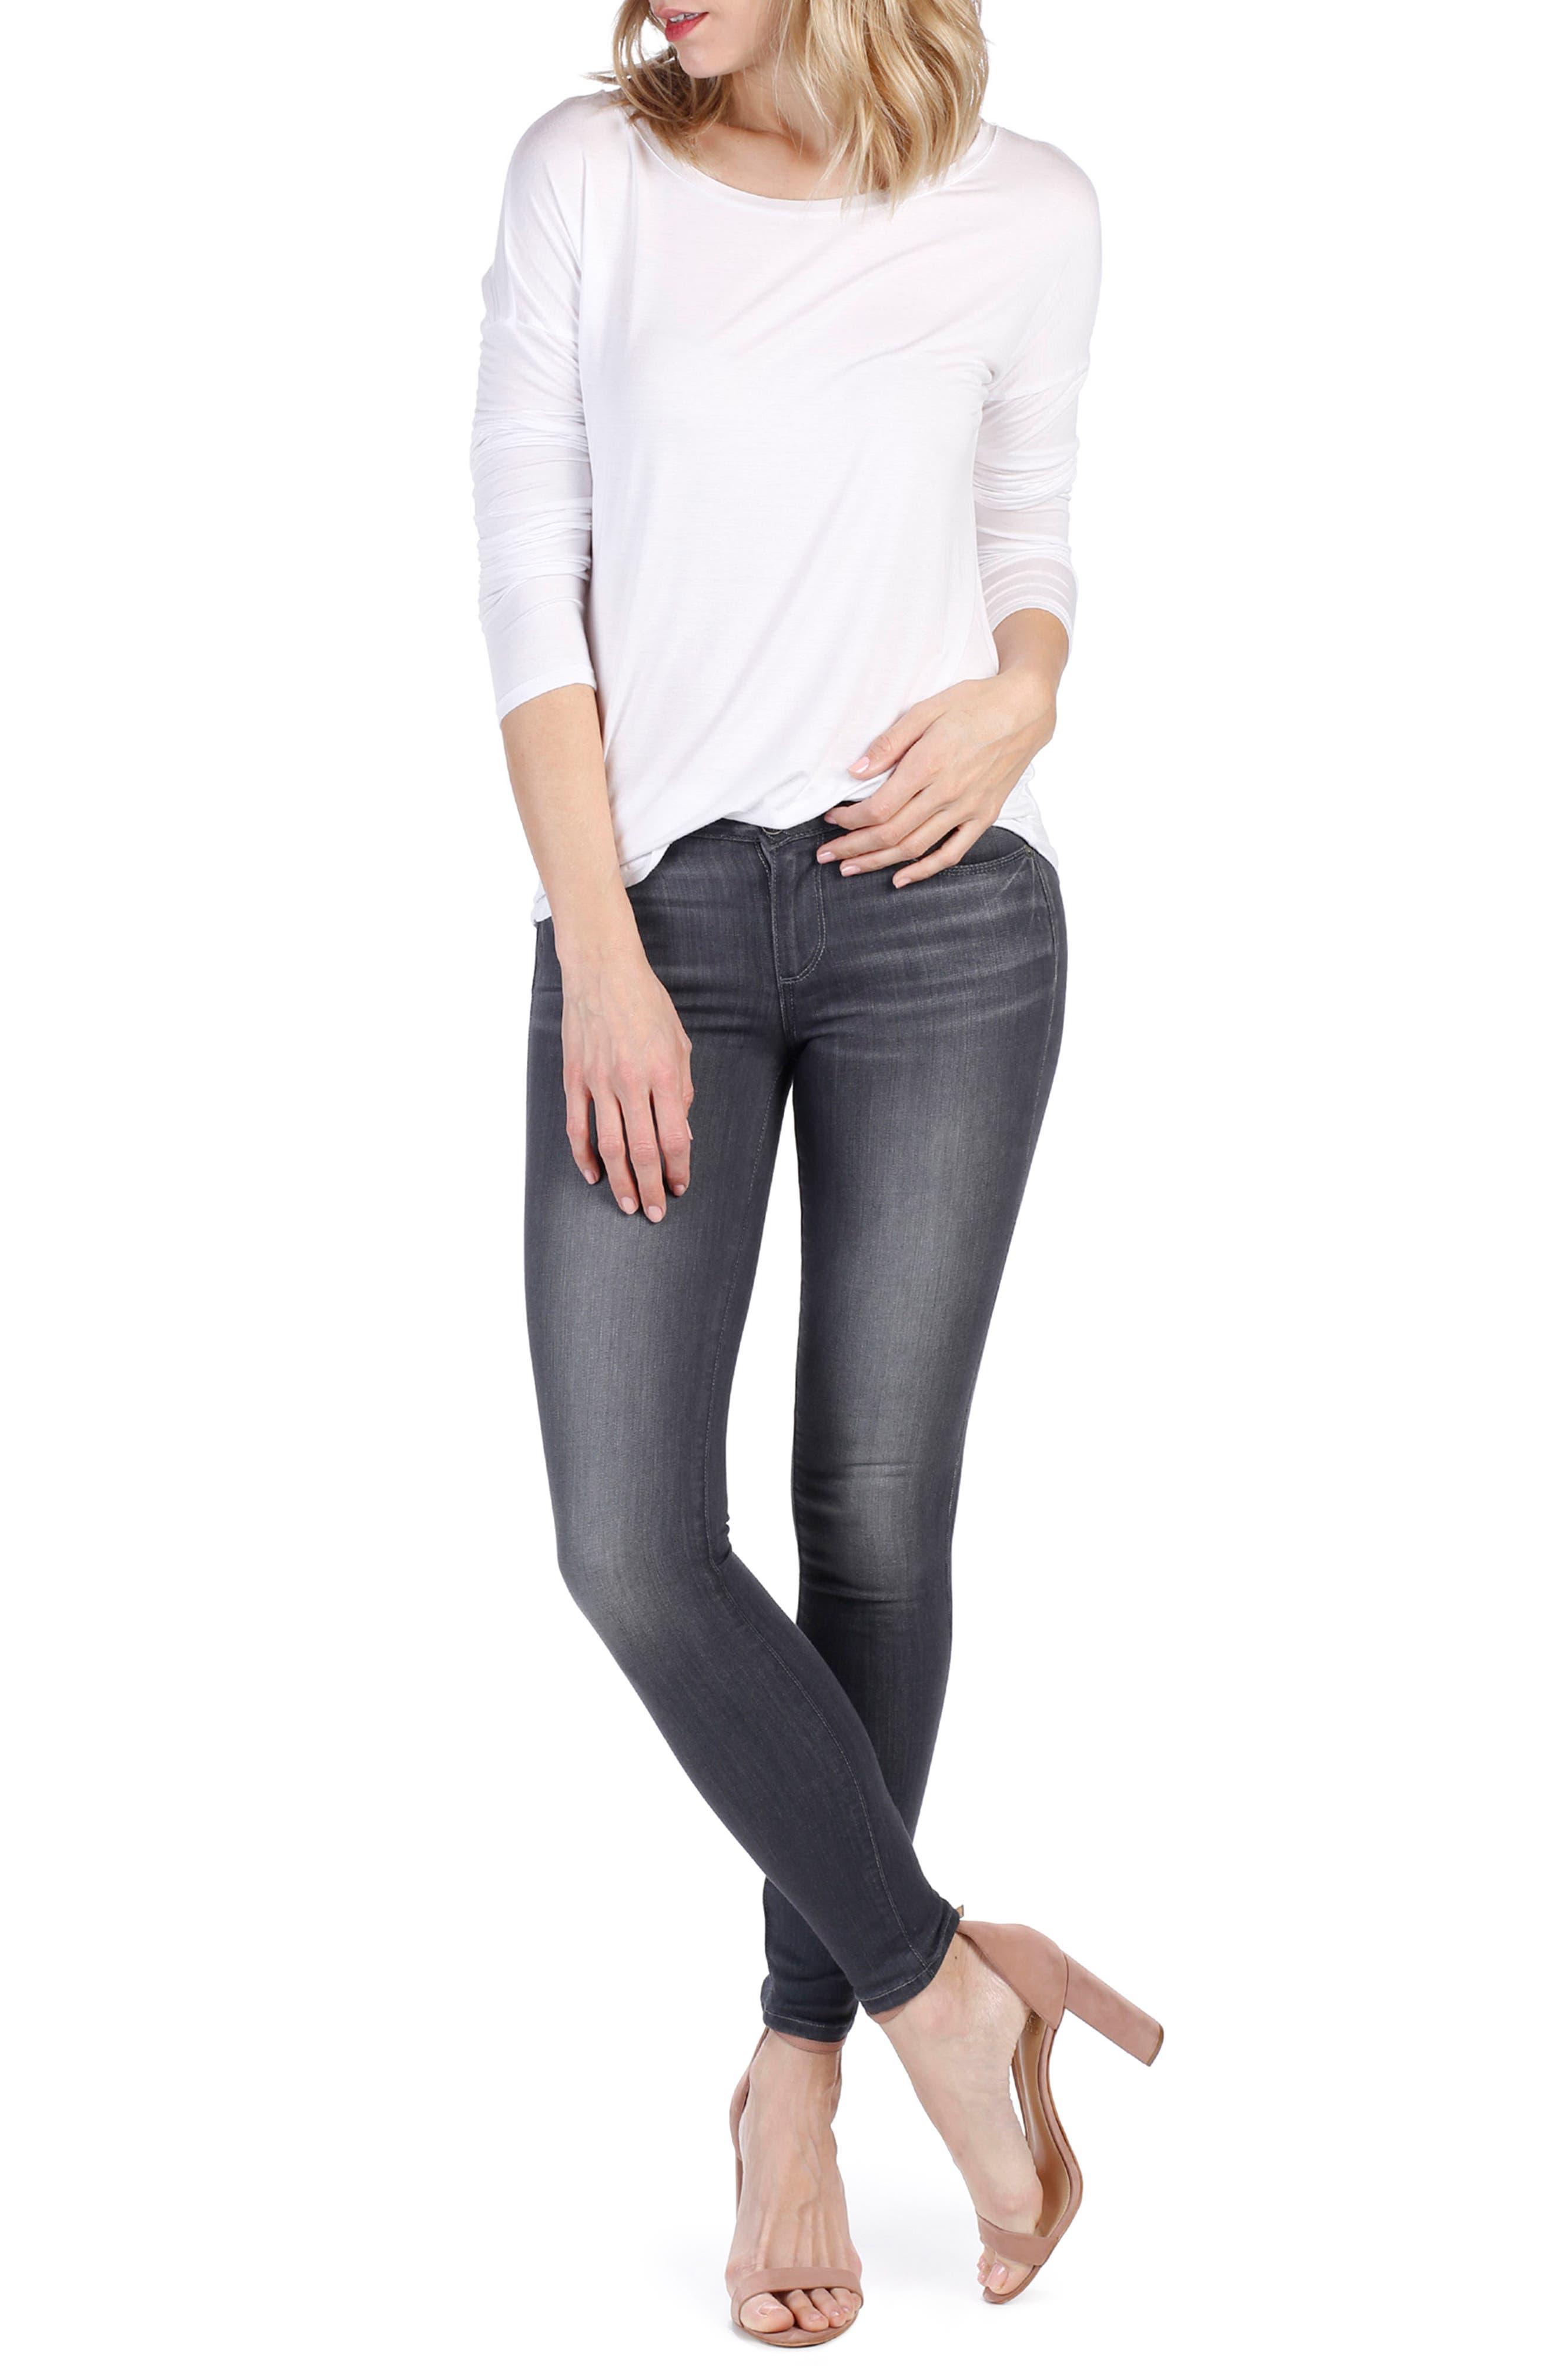 Transcend - Verdugo Ankle Skinny Jeans,                             Alternate thumbnail 2, color,                             020